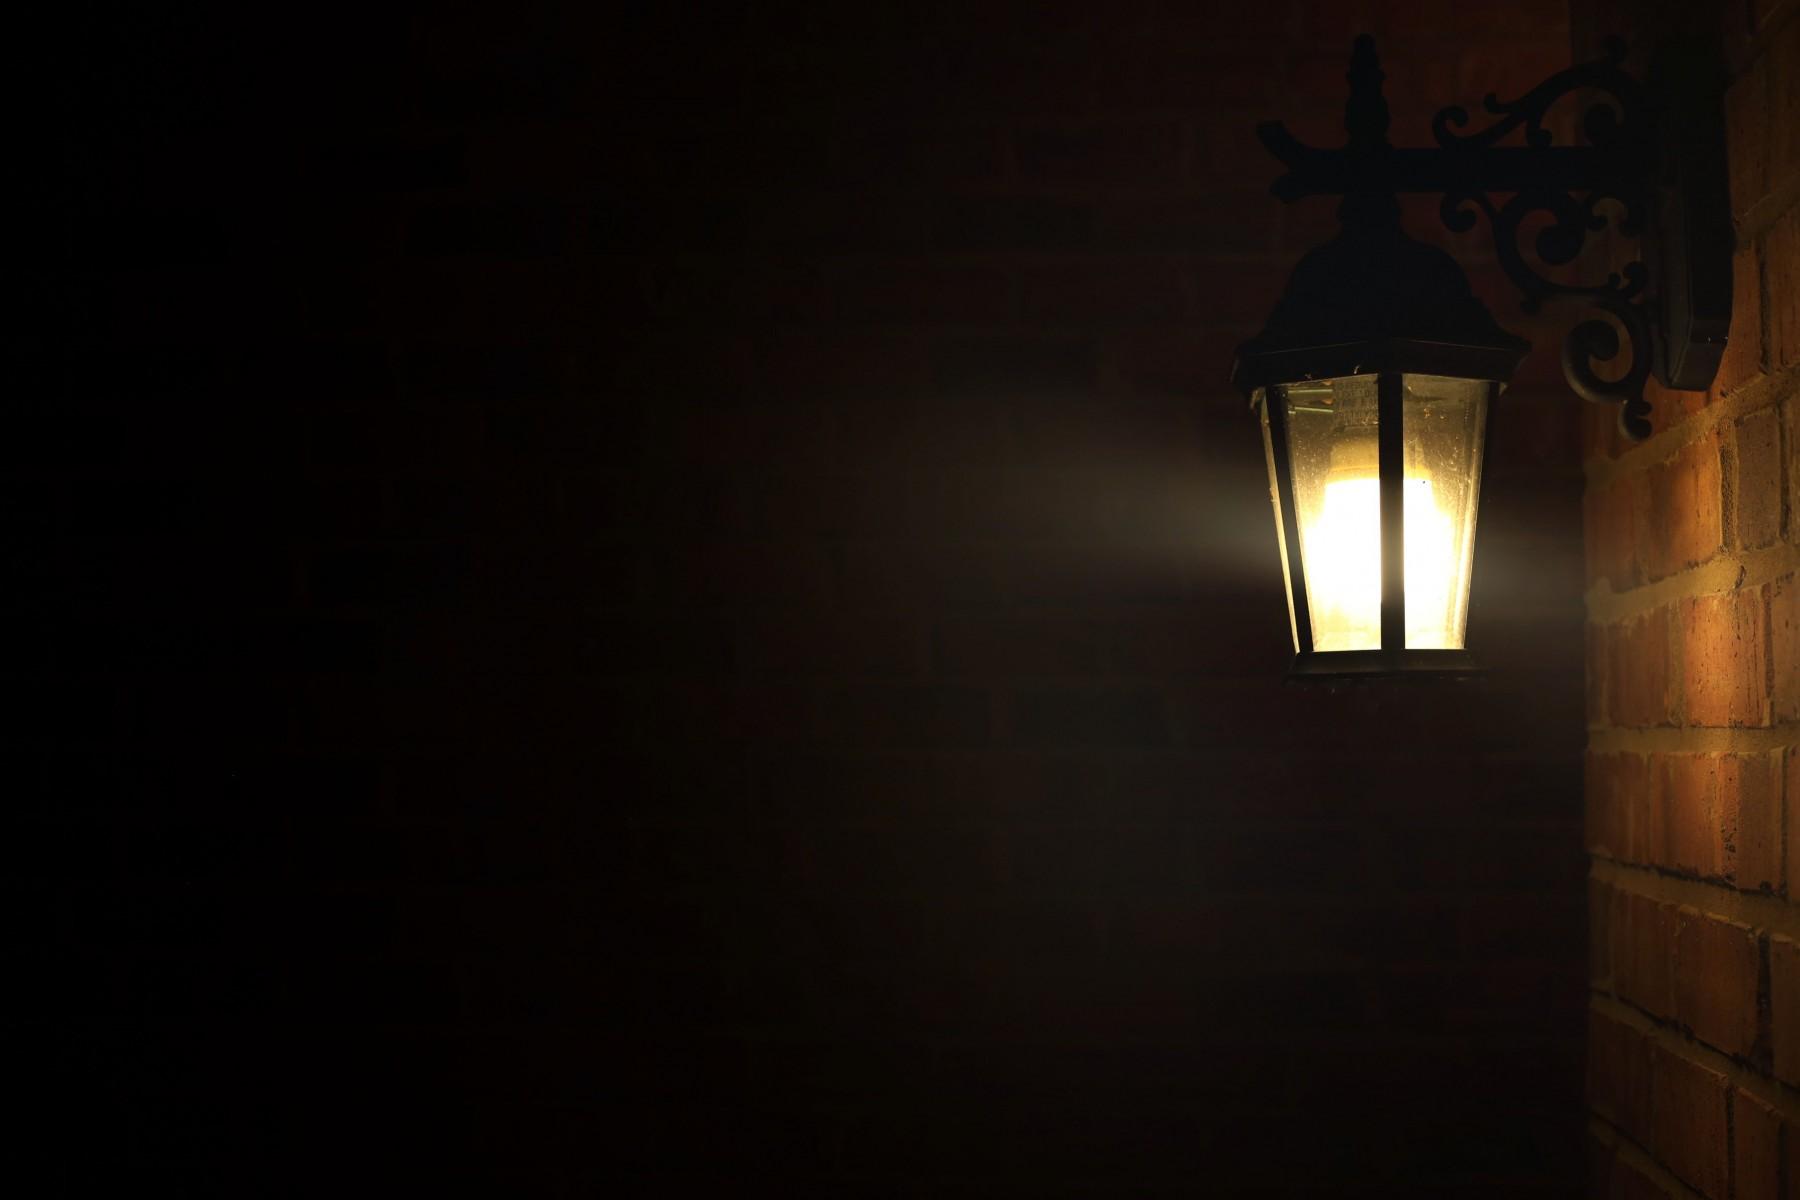 porch light - Tim Kyle